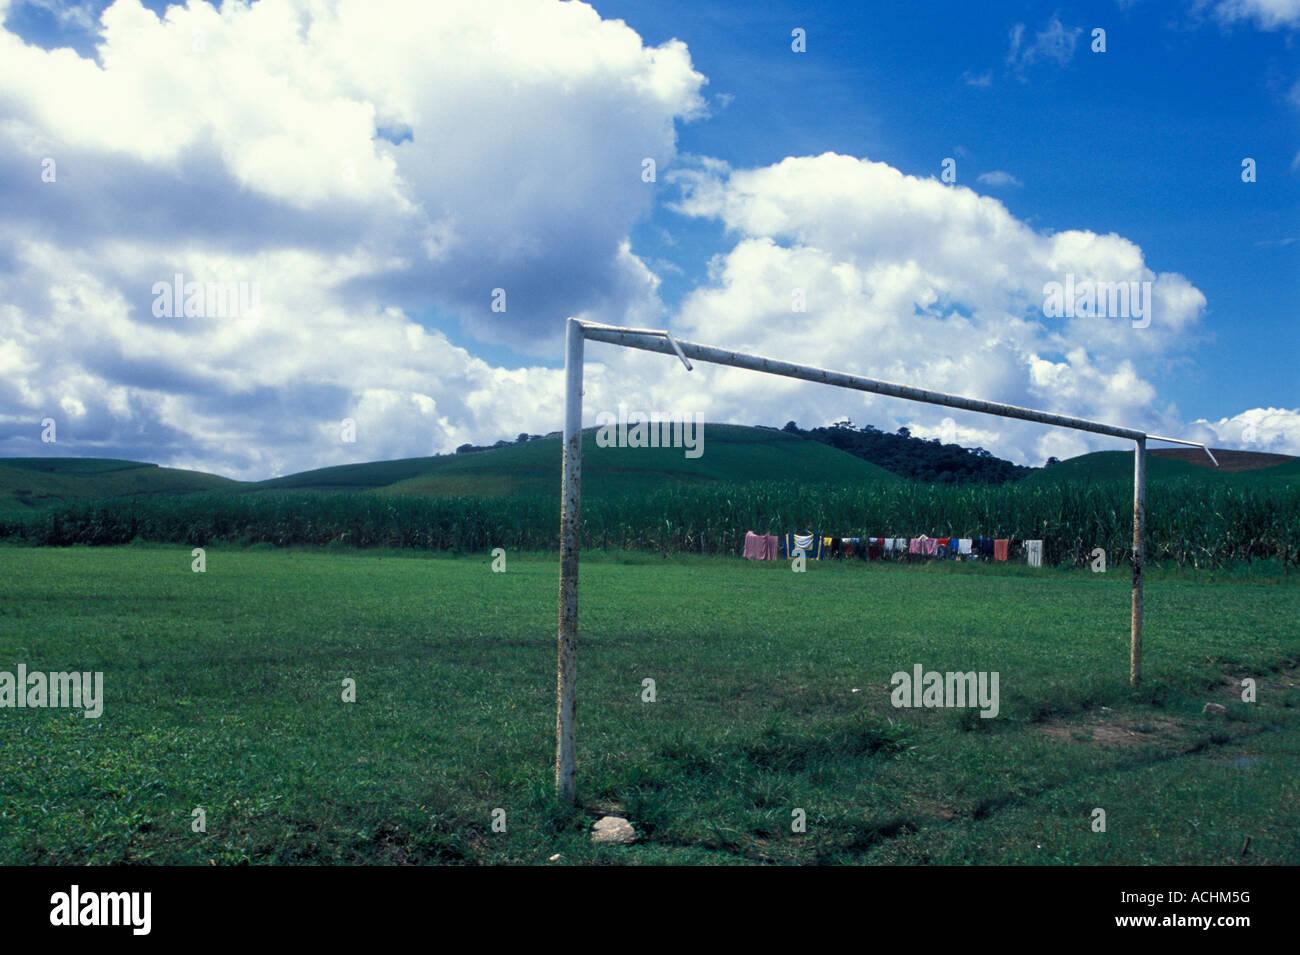 Clothes drying at soccer field besides sugarcane plantation Pernambuco State Brazil - Stock Image